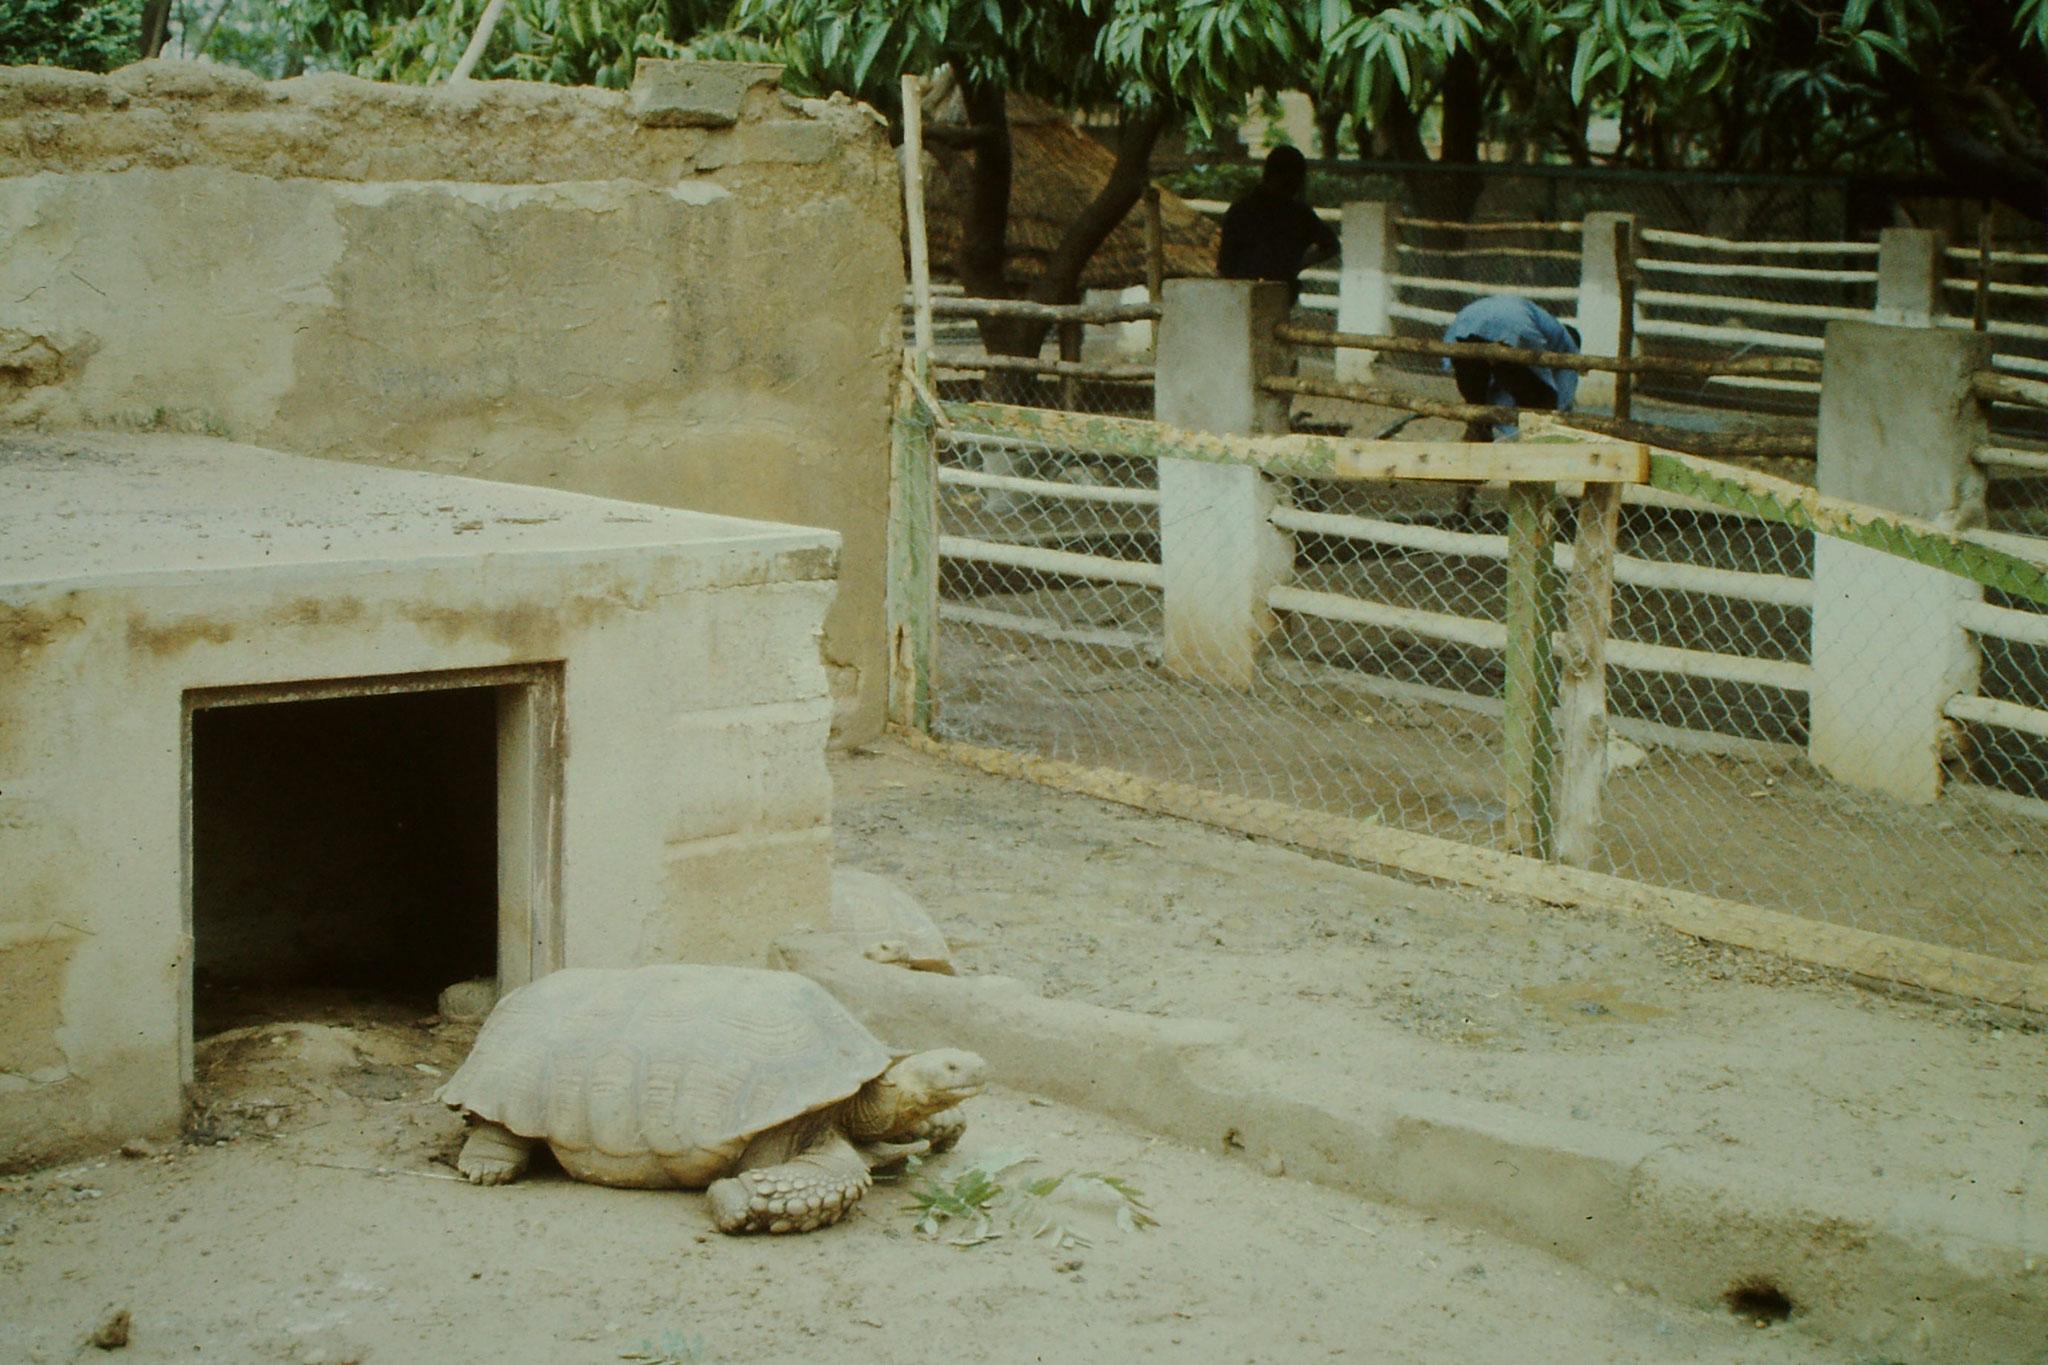 Riesenschildkröte im Zoo von Ouagadougou..